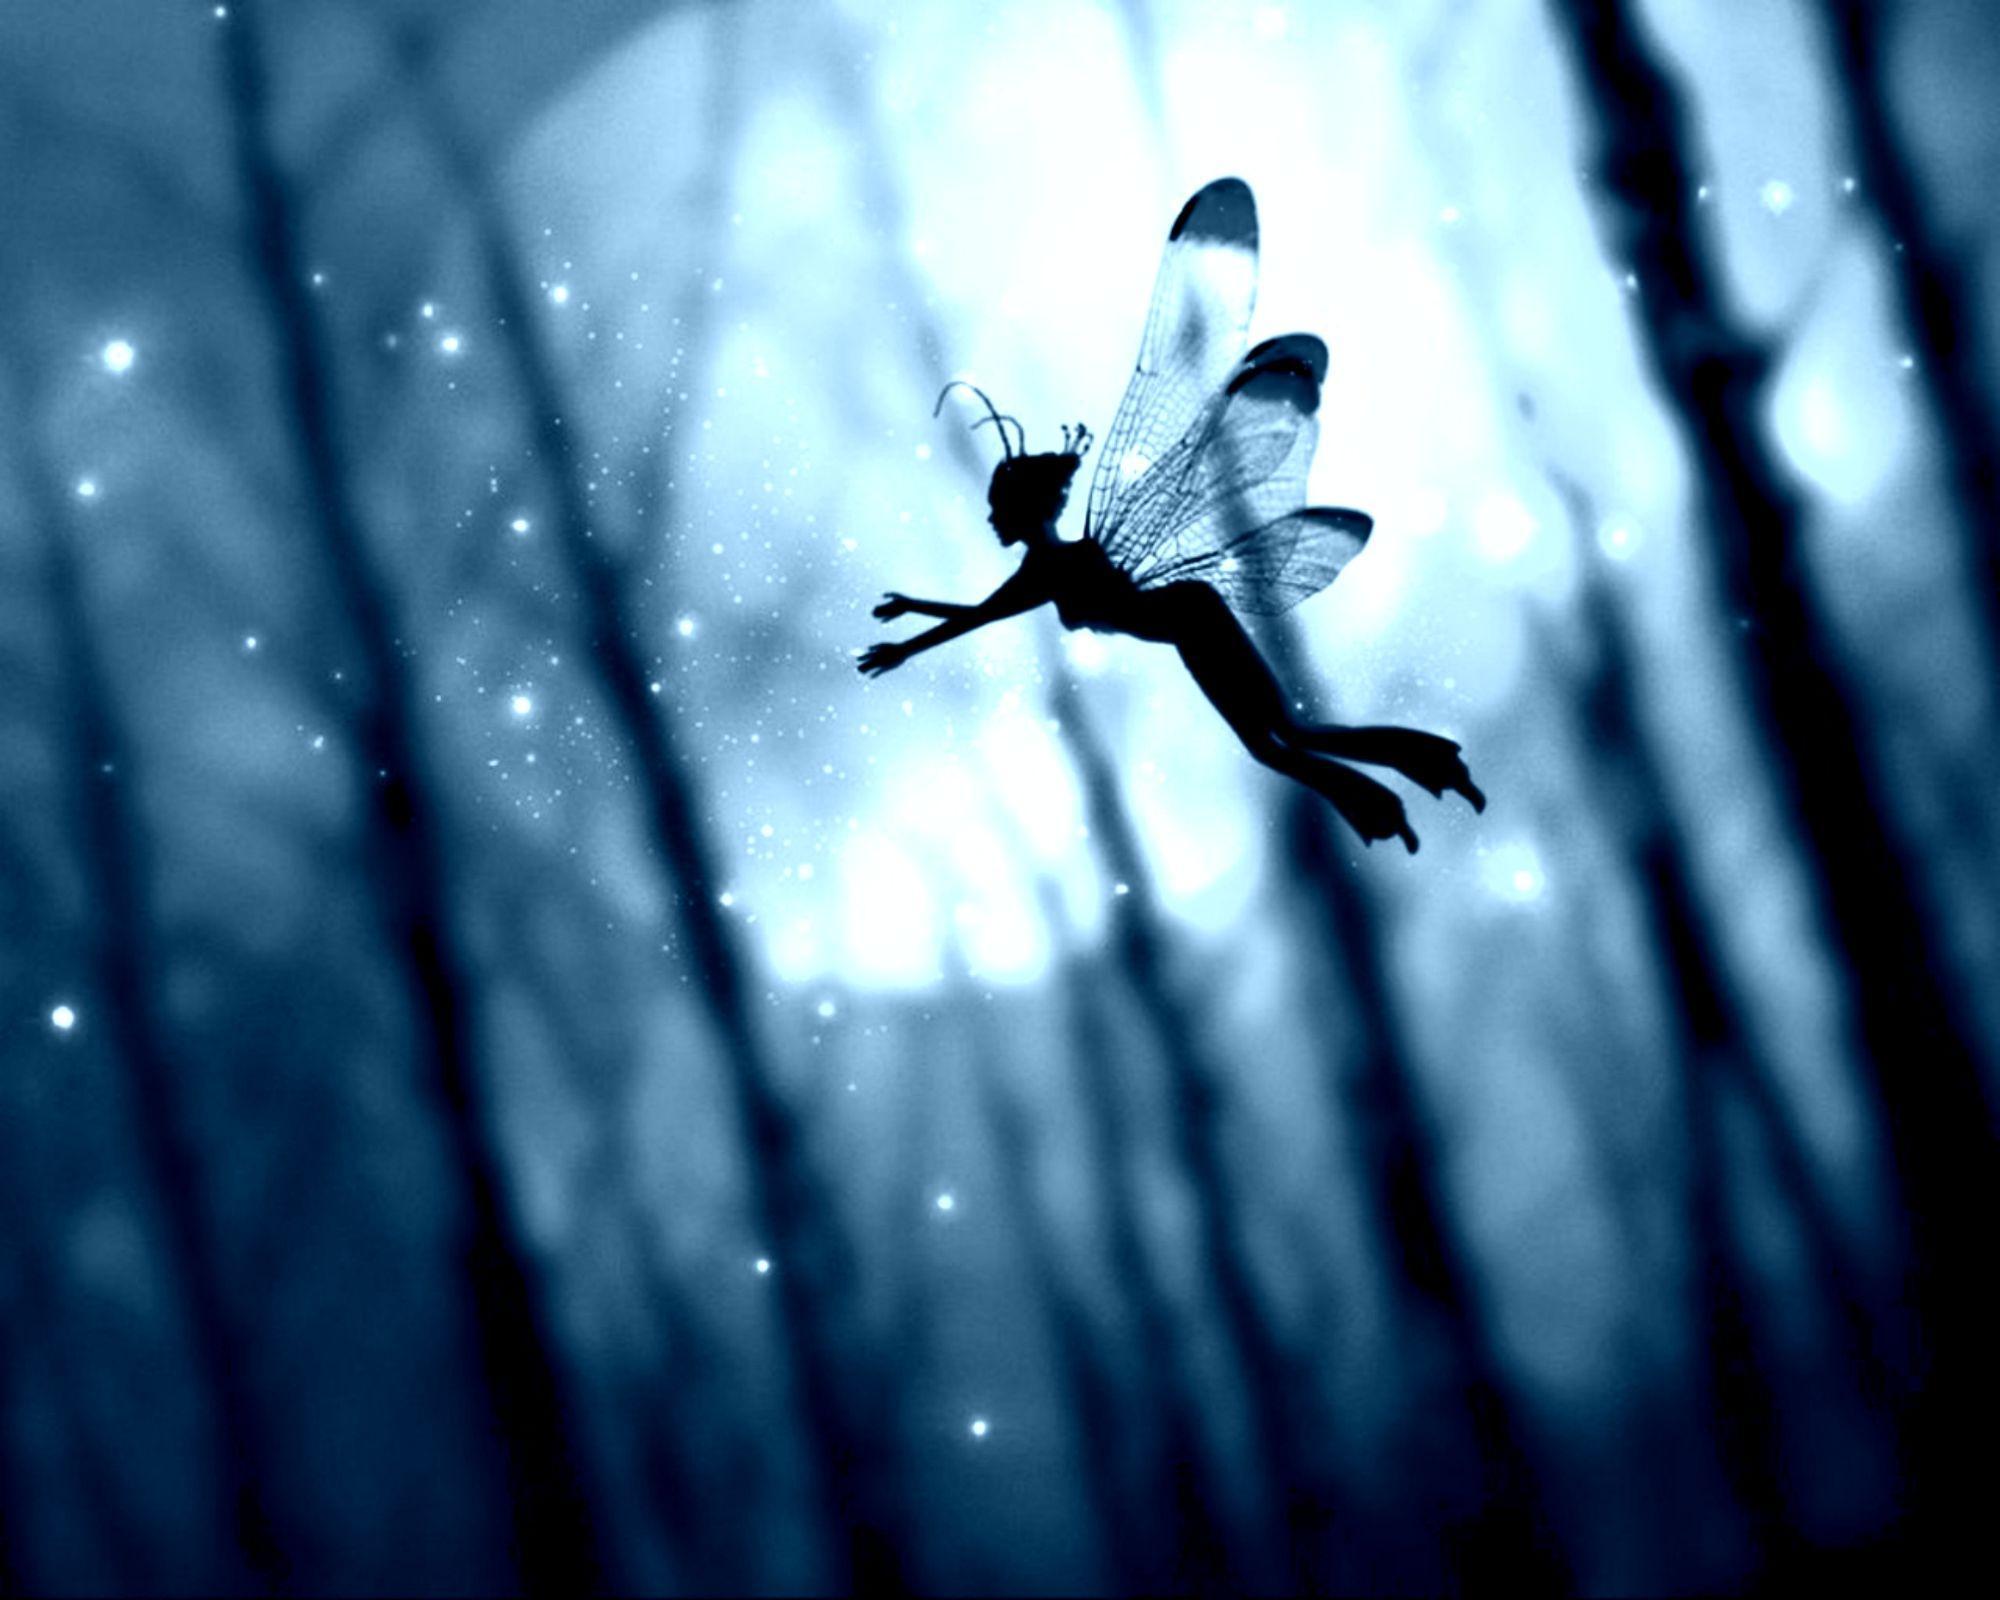 Download Dark Fairy Wallpaper 65   Wallpaper For your screen 2000x1600